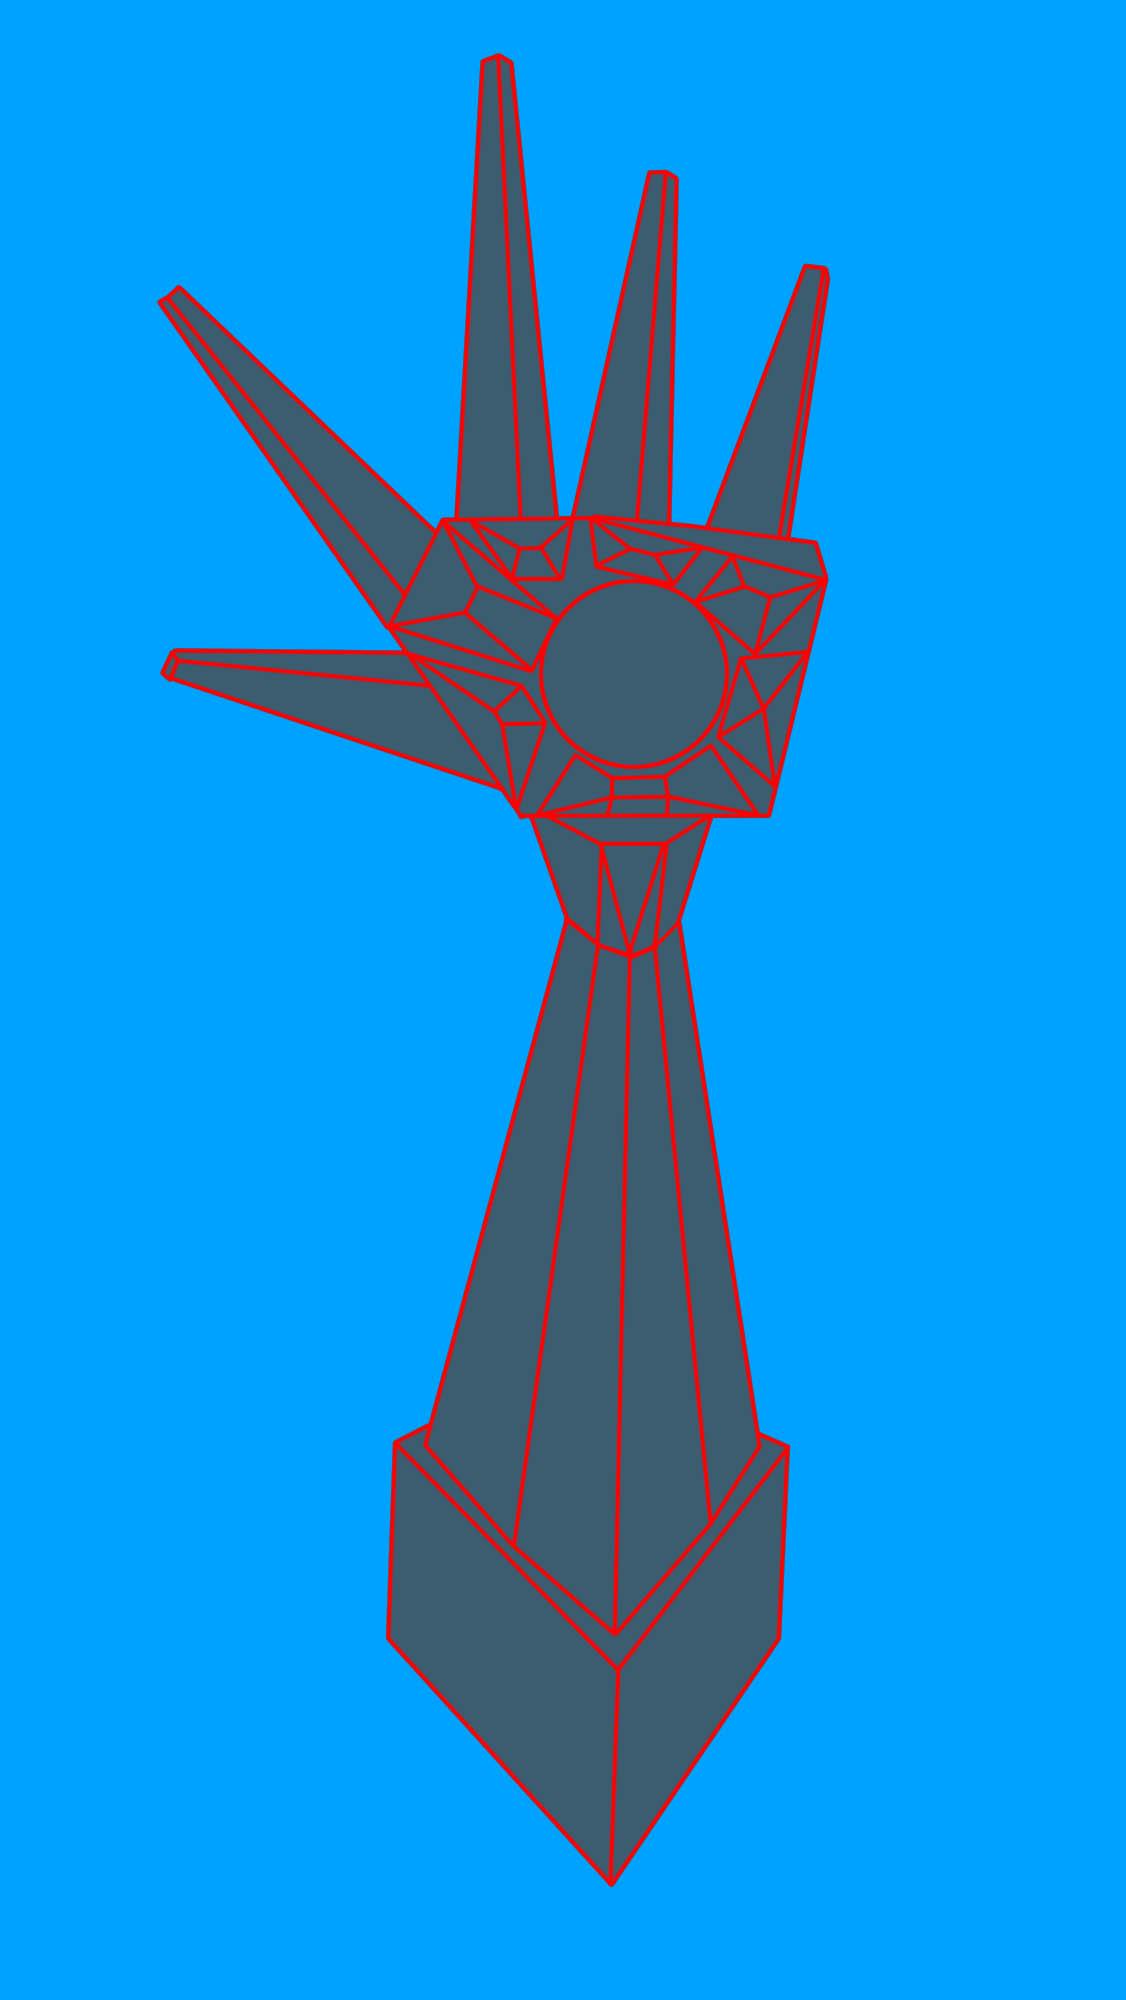 Arcade Hand outlines over blue.jpg